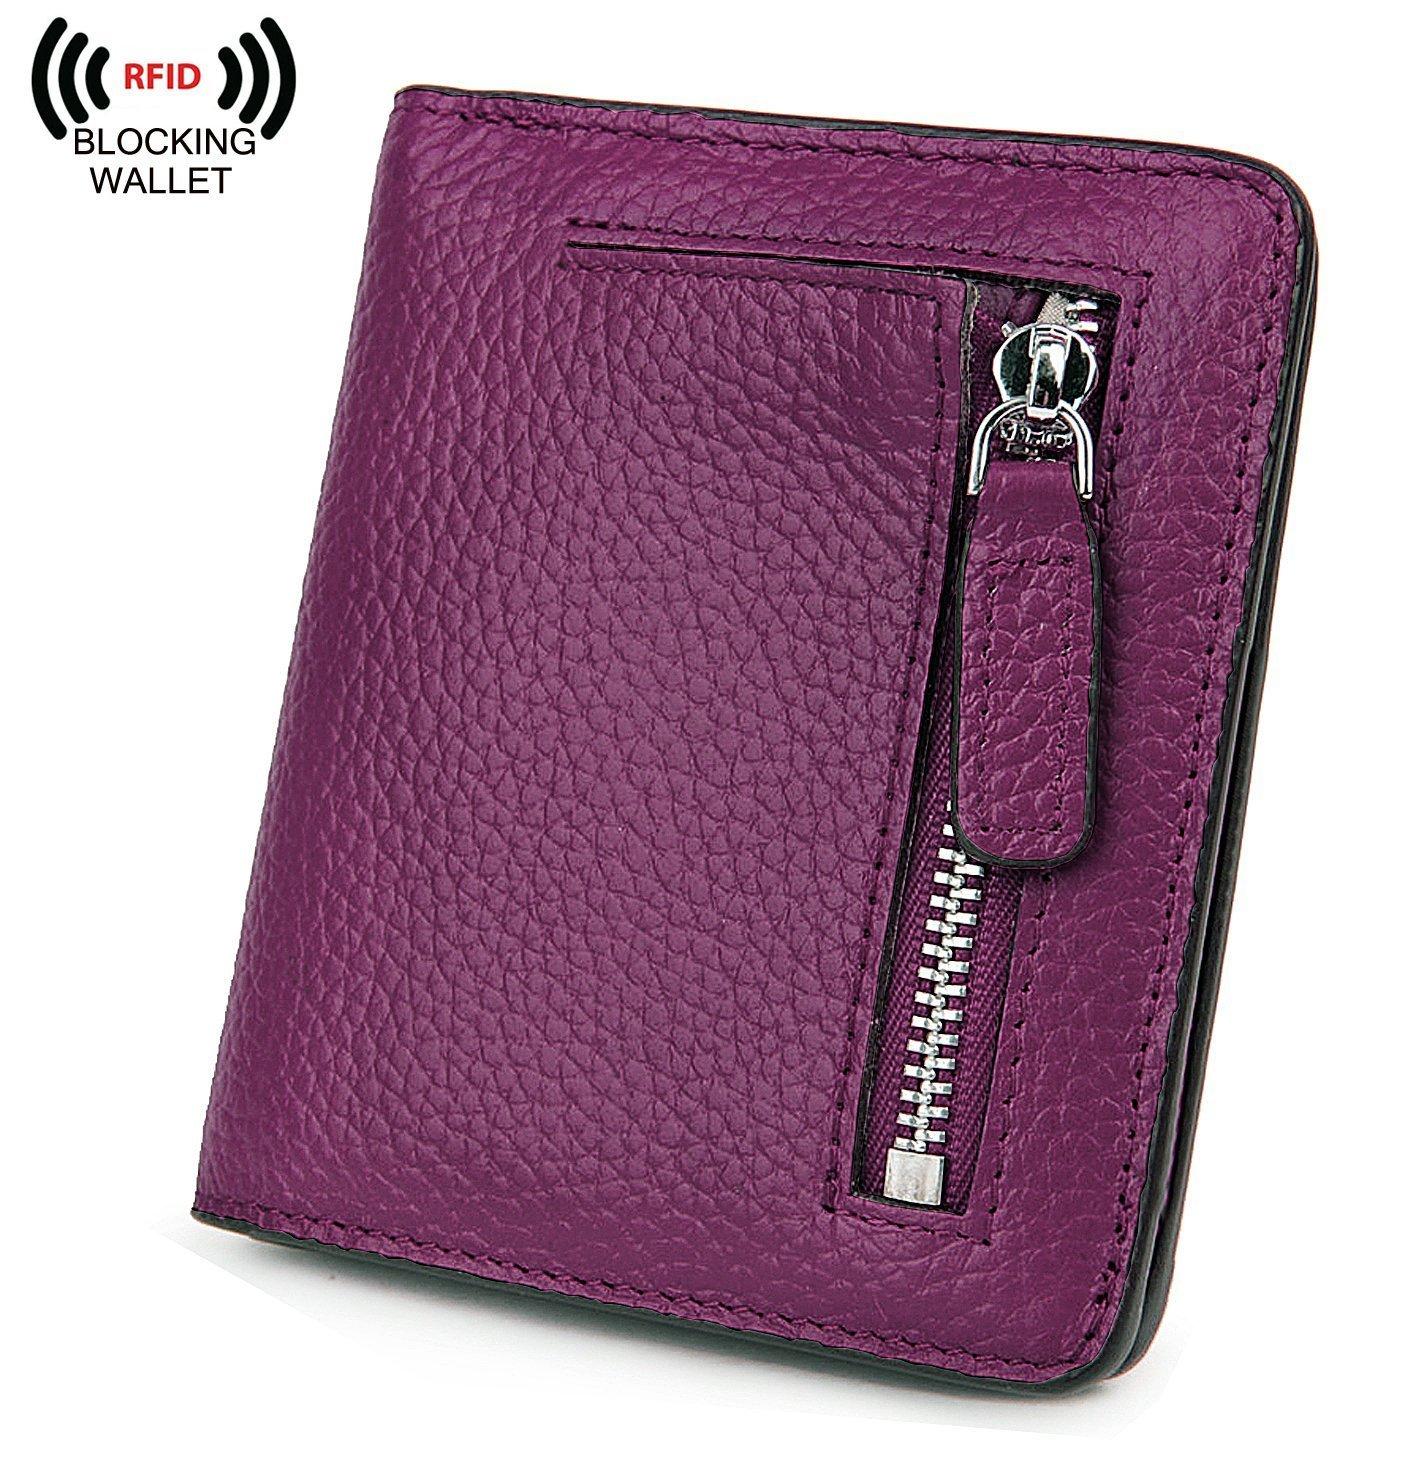 BIG SALE-AINIMOER Women's RFID Blocking Leather Small Compact Bifold Pocket Wallet Ladies Mini Purse with id Window (Dark Magenta)